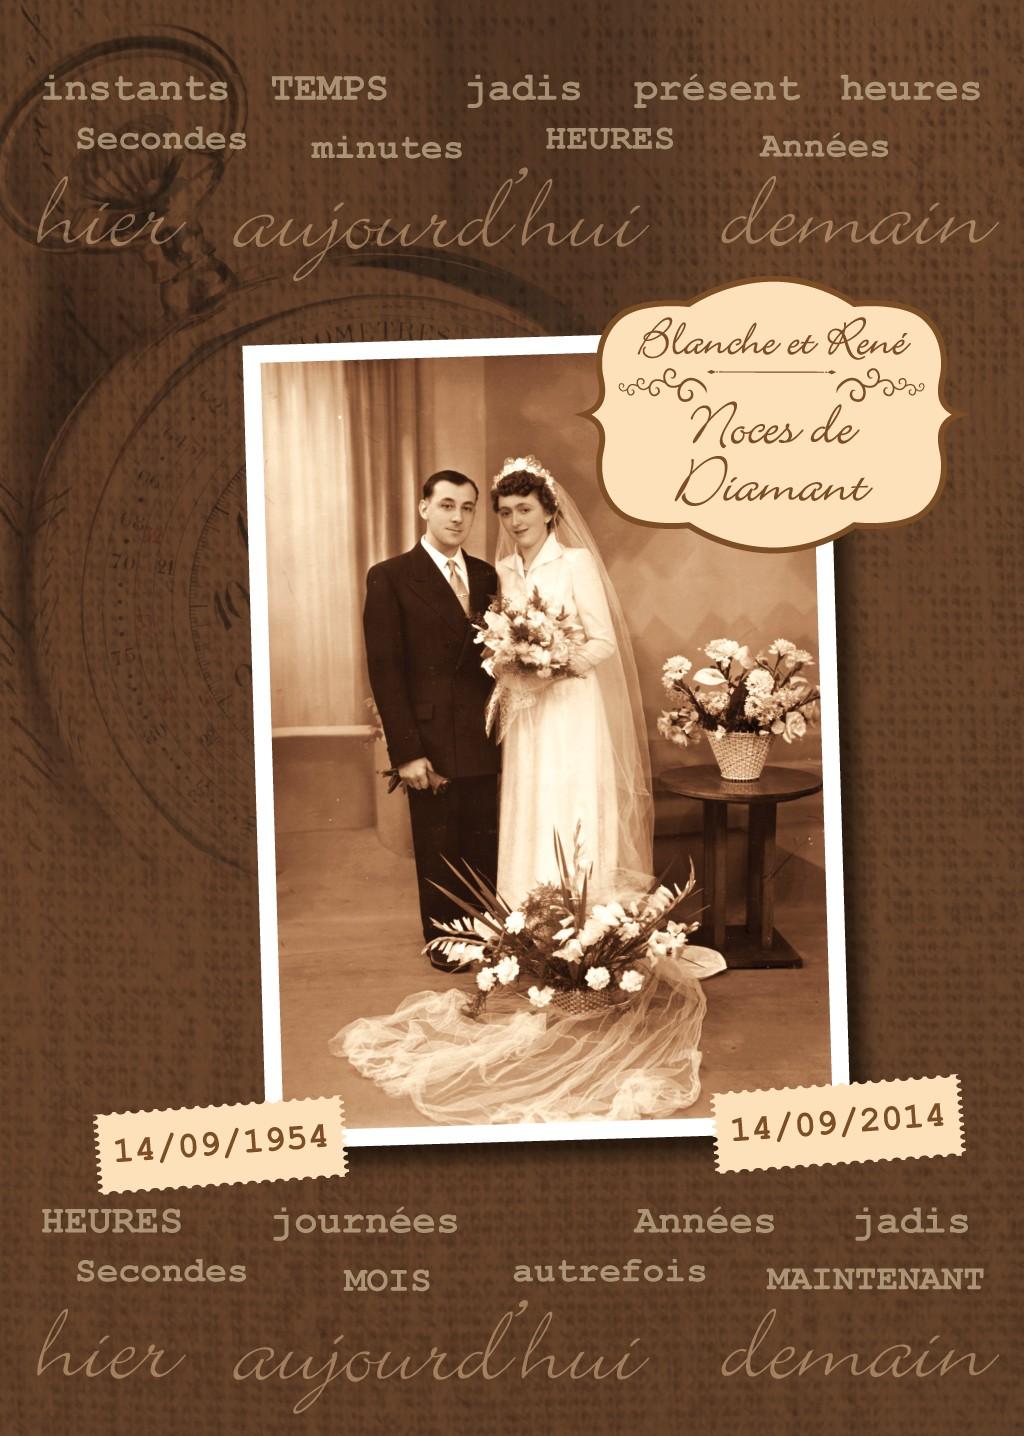 anniversaire de mariage noces de diamant